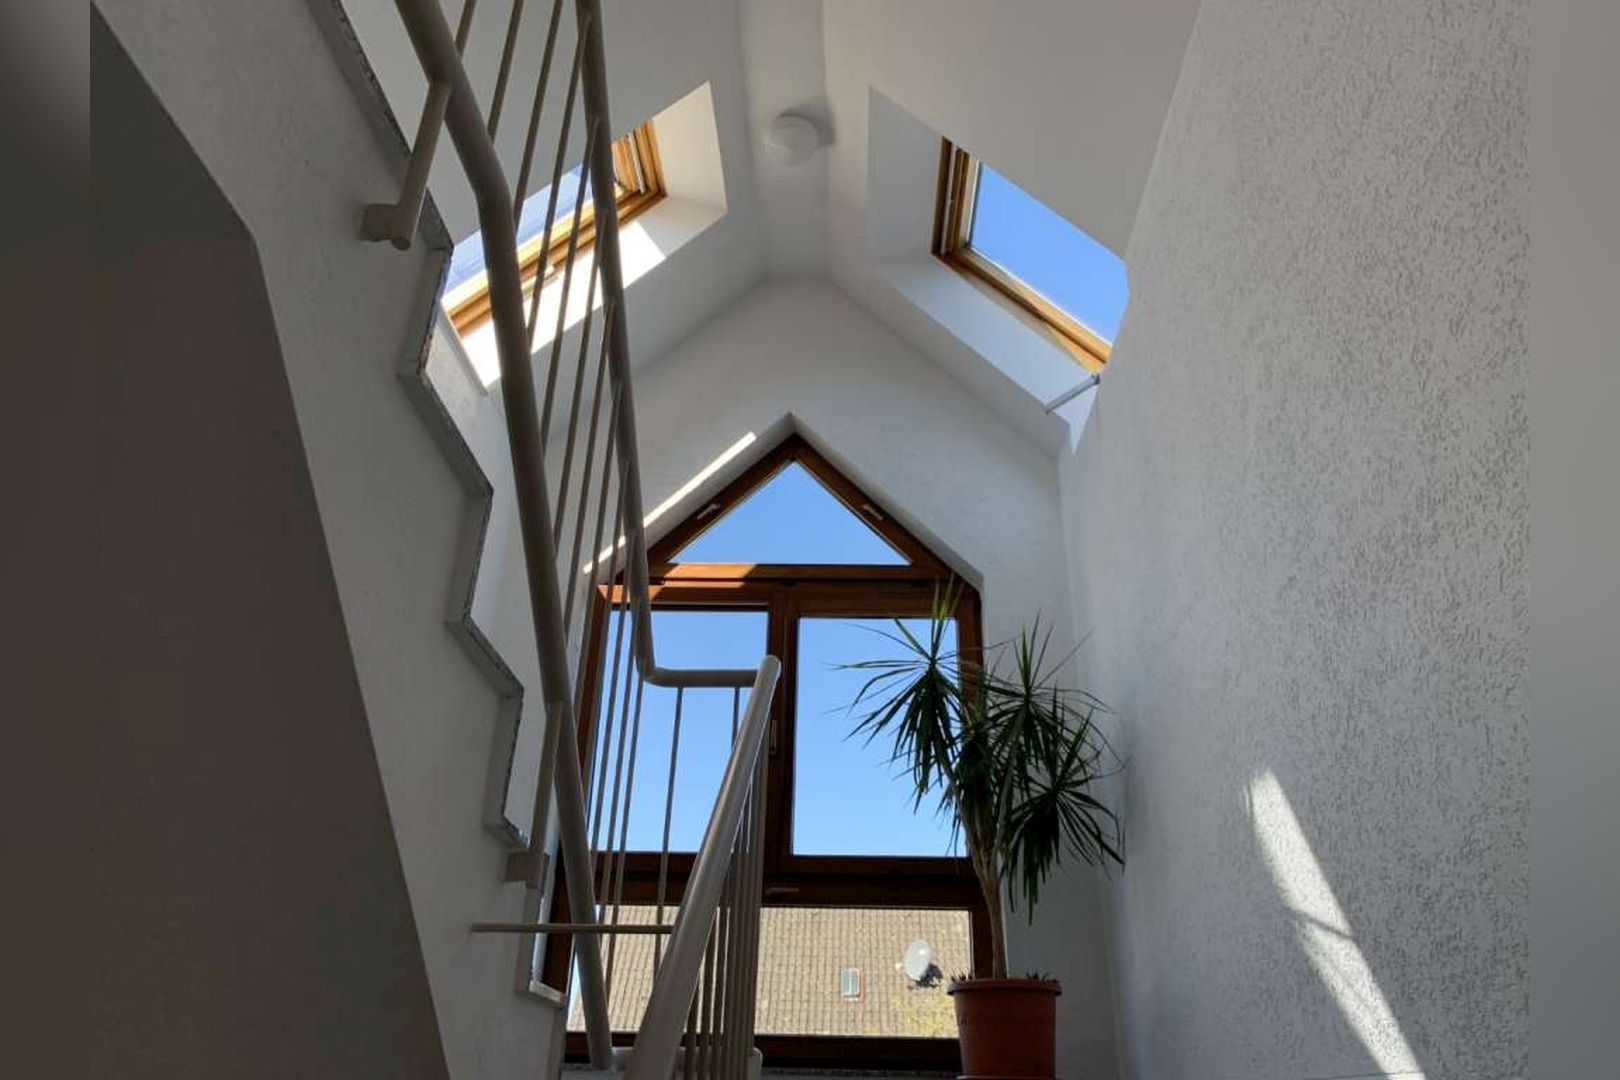 Immobilie Nr.0255 | Uerdinger Straße 21, 40668 Meerbusch